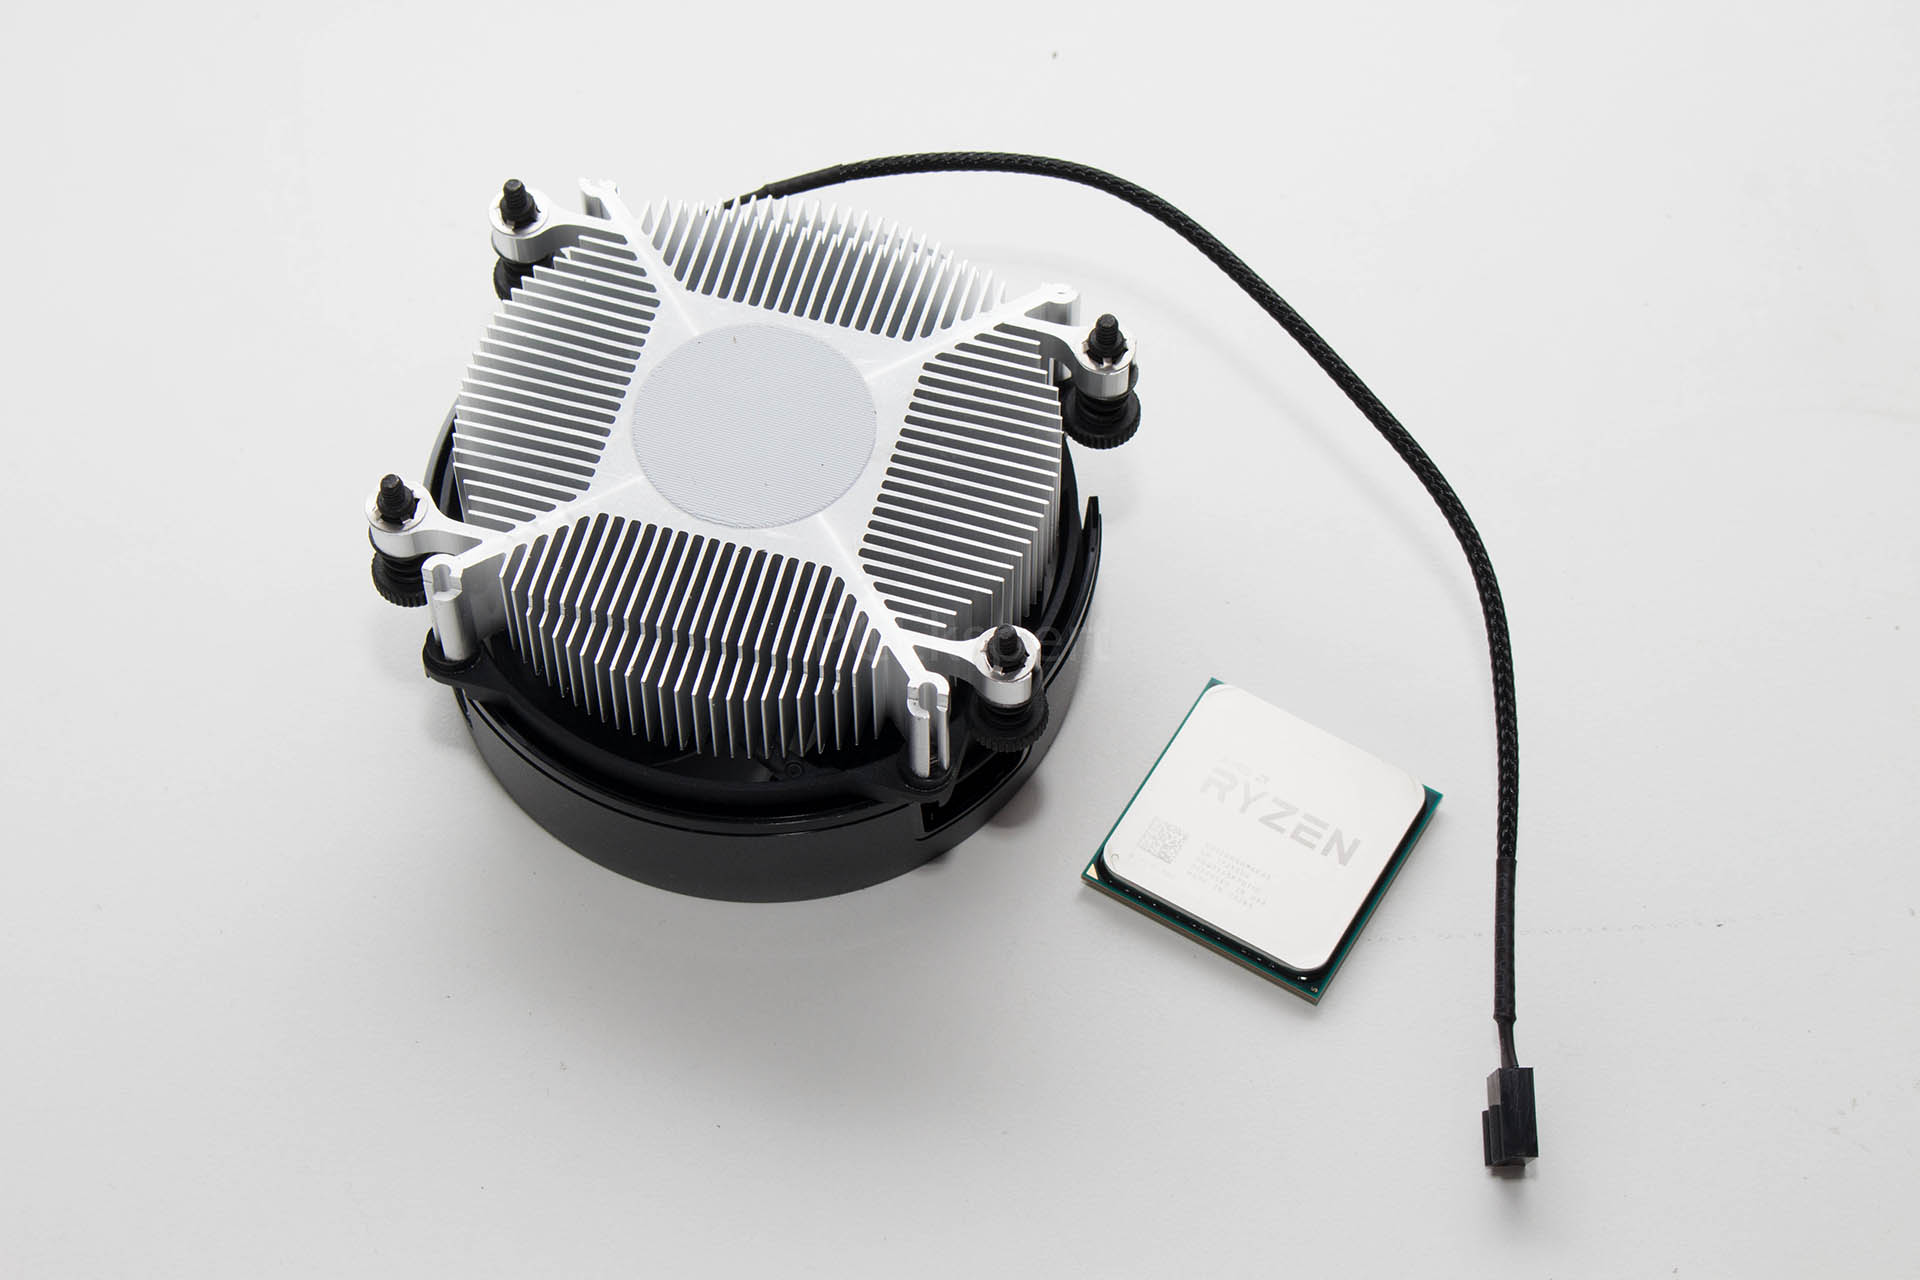 PC Ekspert - Hardware EZine - AMD Ryzen 3 1300X & 1200 recenzija